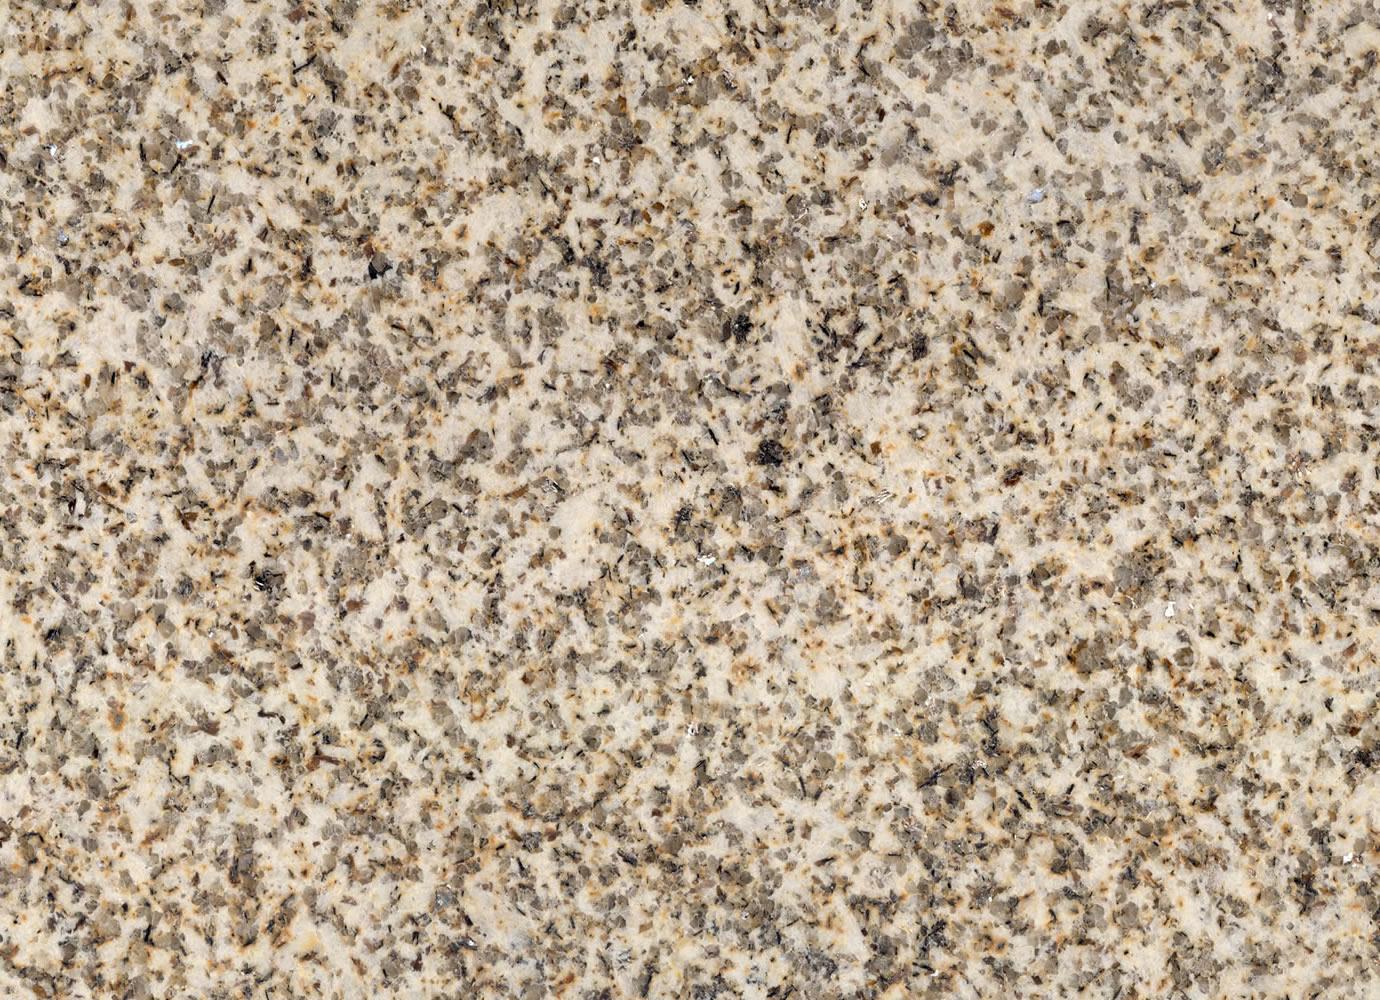 Incoveca granitos s a for Tipos de encimeras de granito